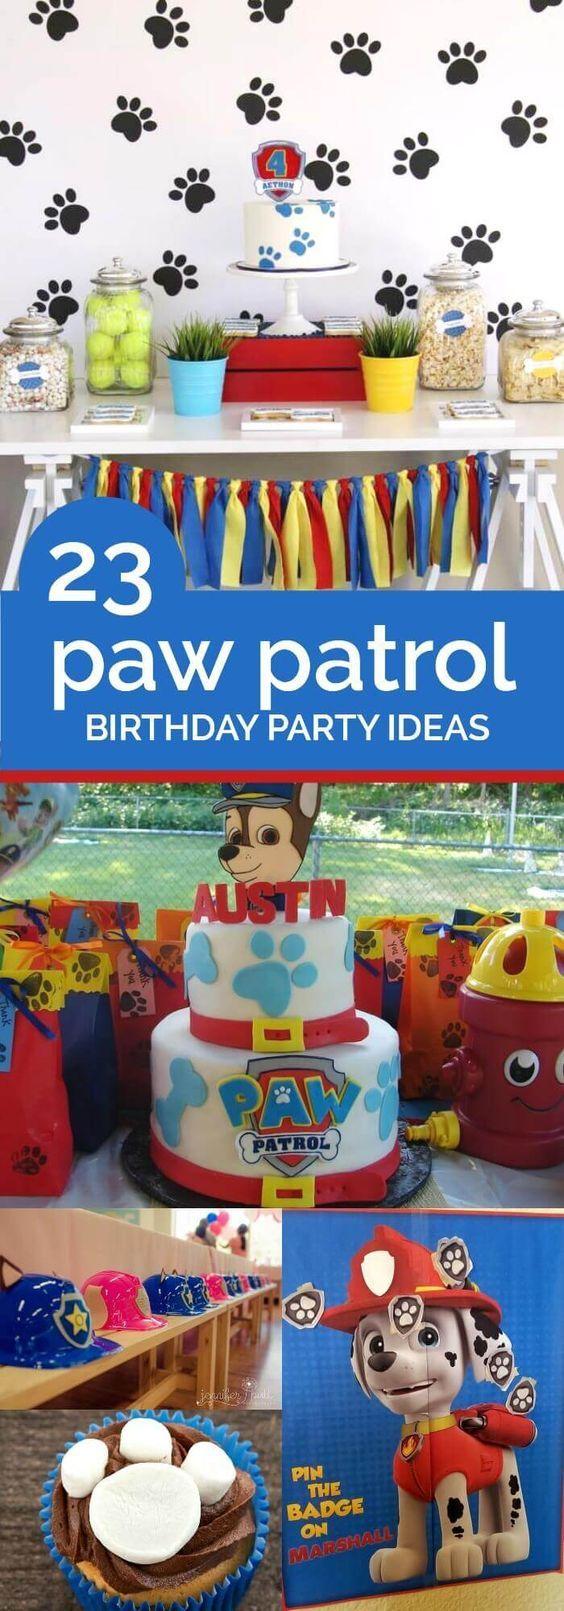 Dog Birthday Decorations 17 Best Ideas About Puppy Party Supplies On Pinterest Puppy